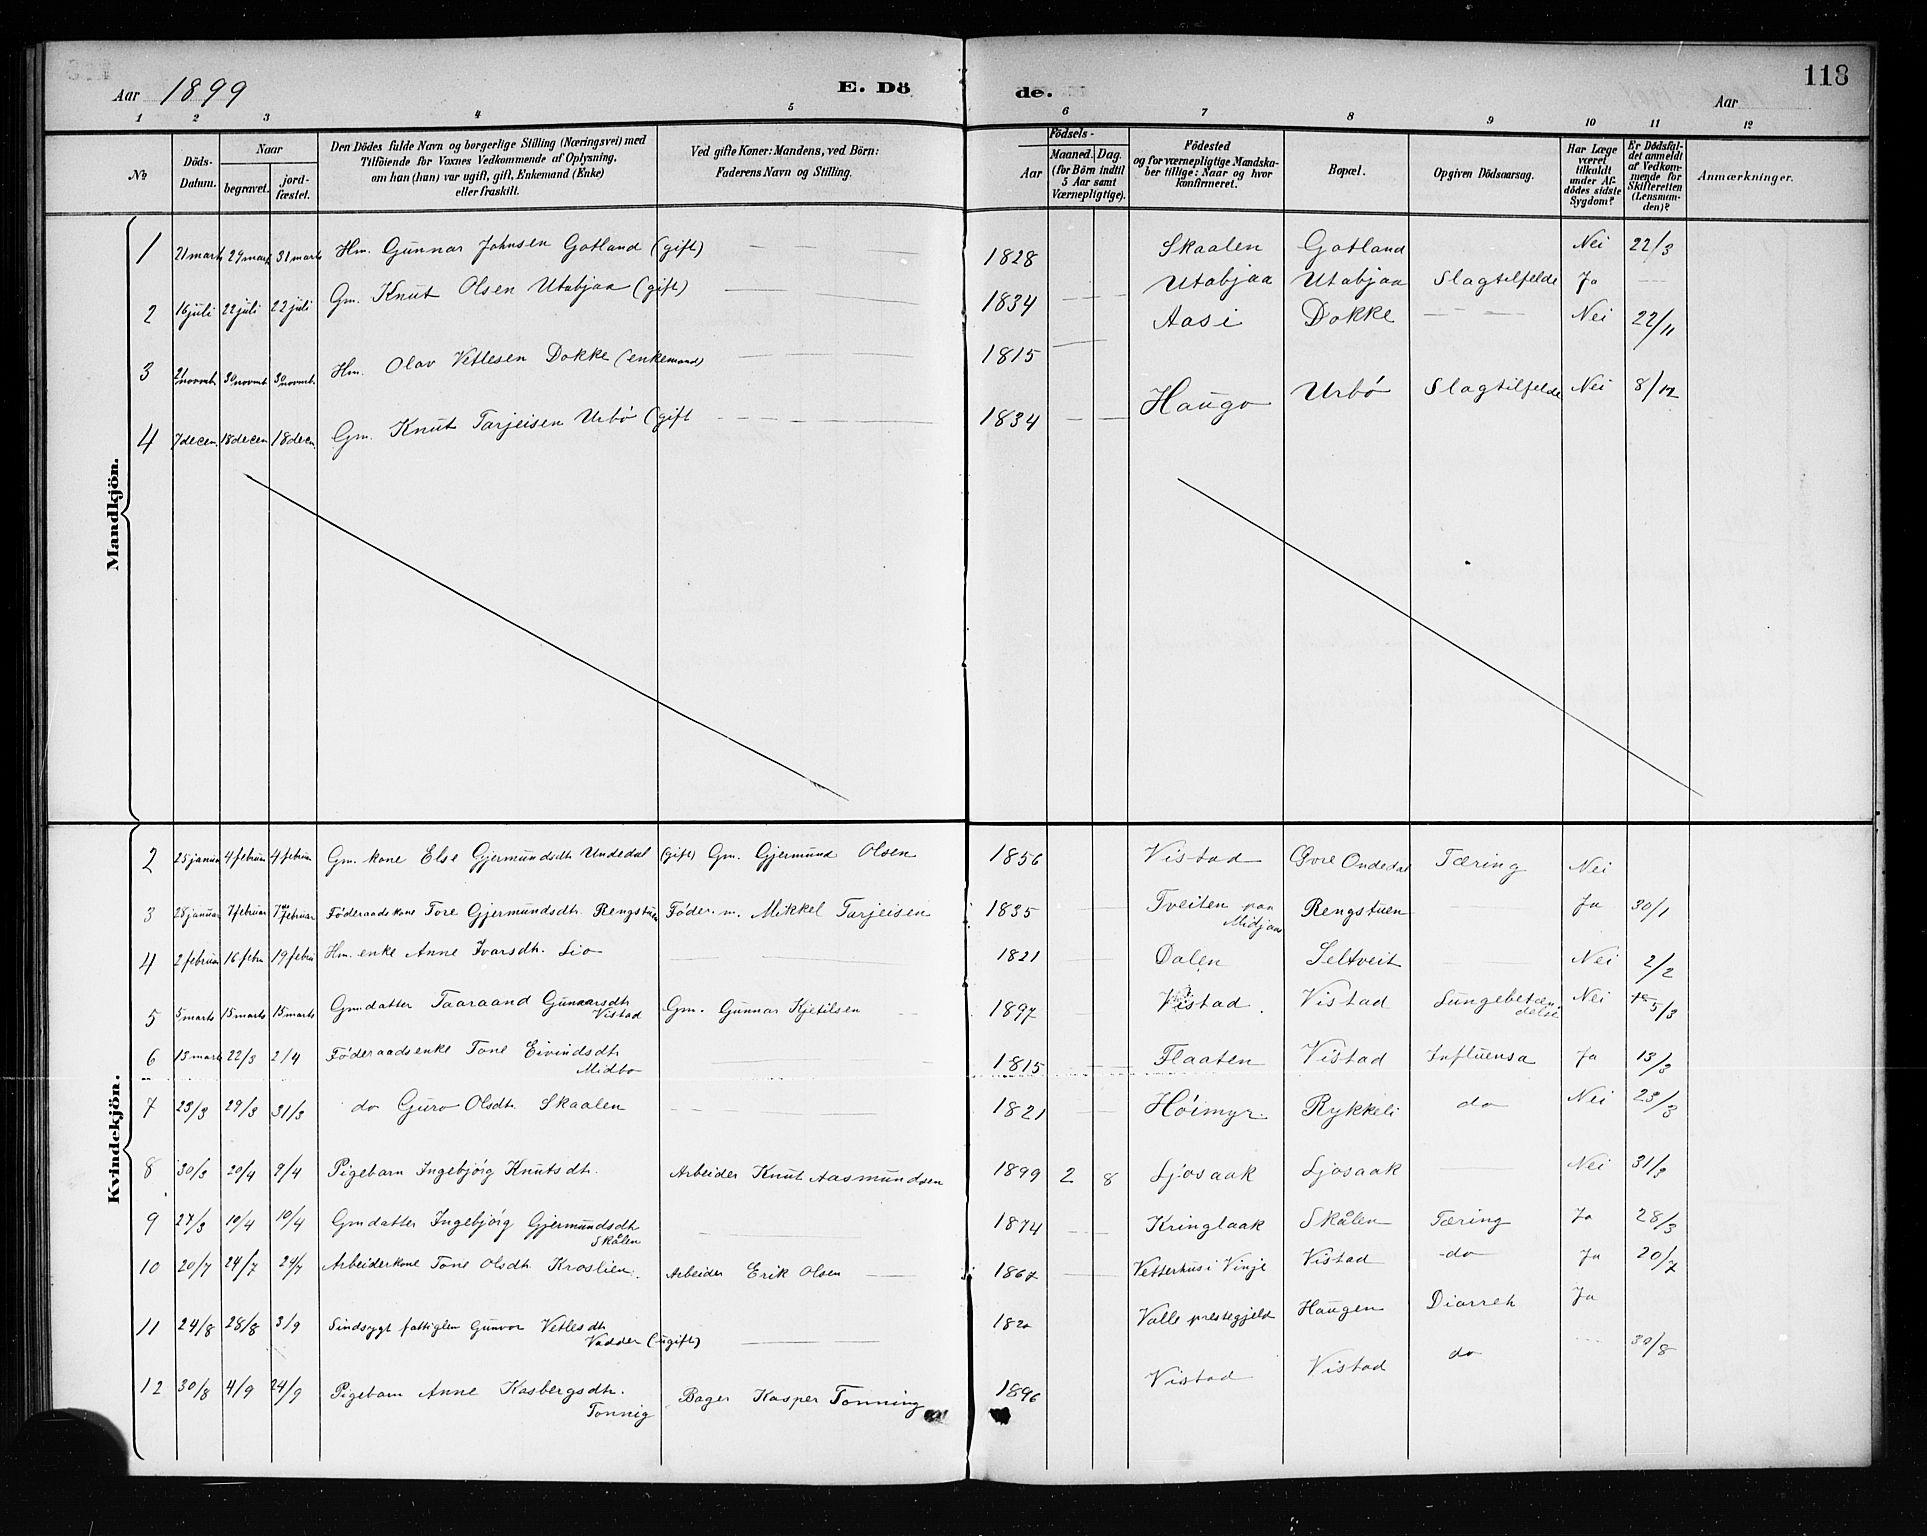 SAKO, Mo kirkebøker, G/Ga/L0002: Klokkerbok nr. I 2, 1892-1914, s. 118